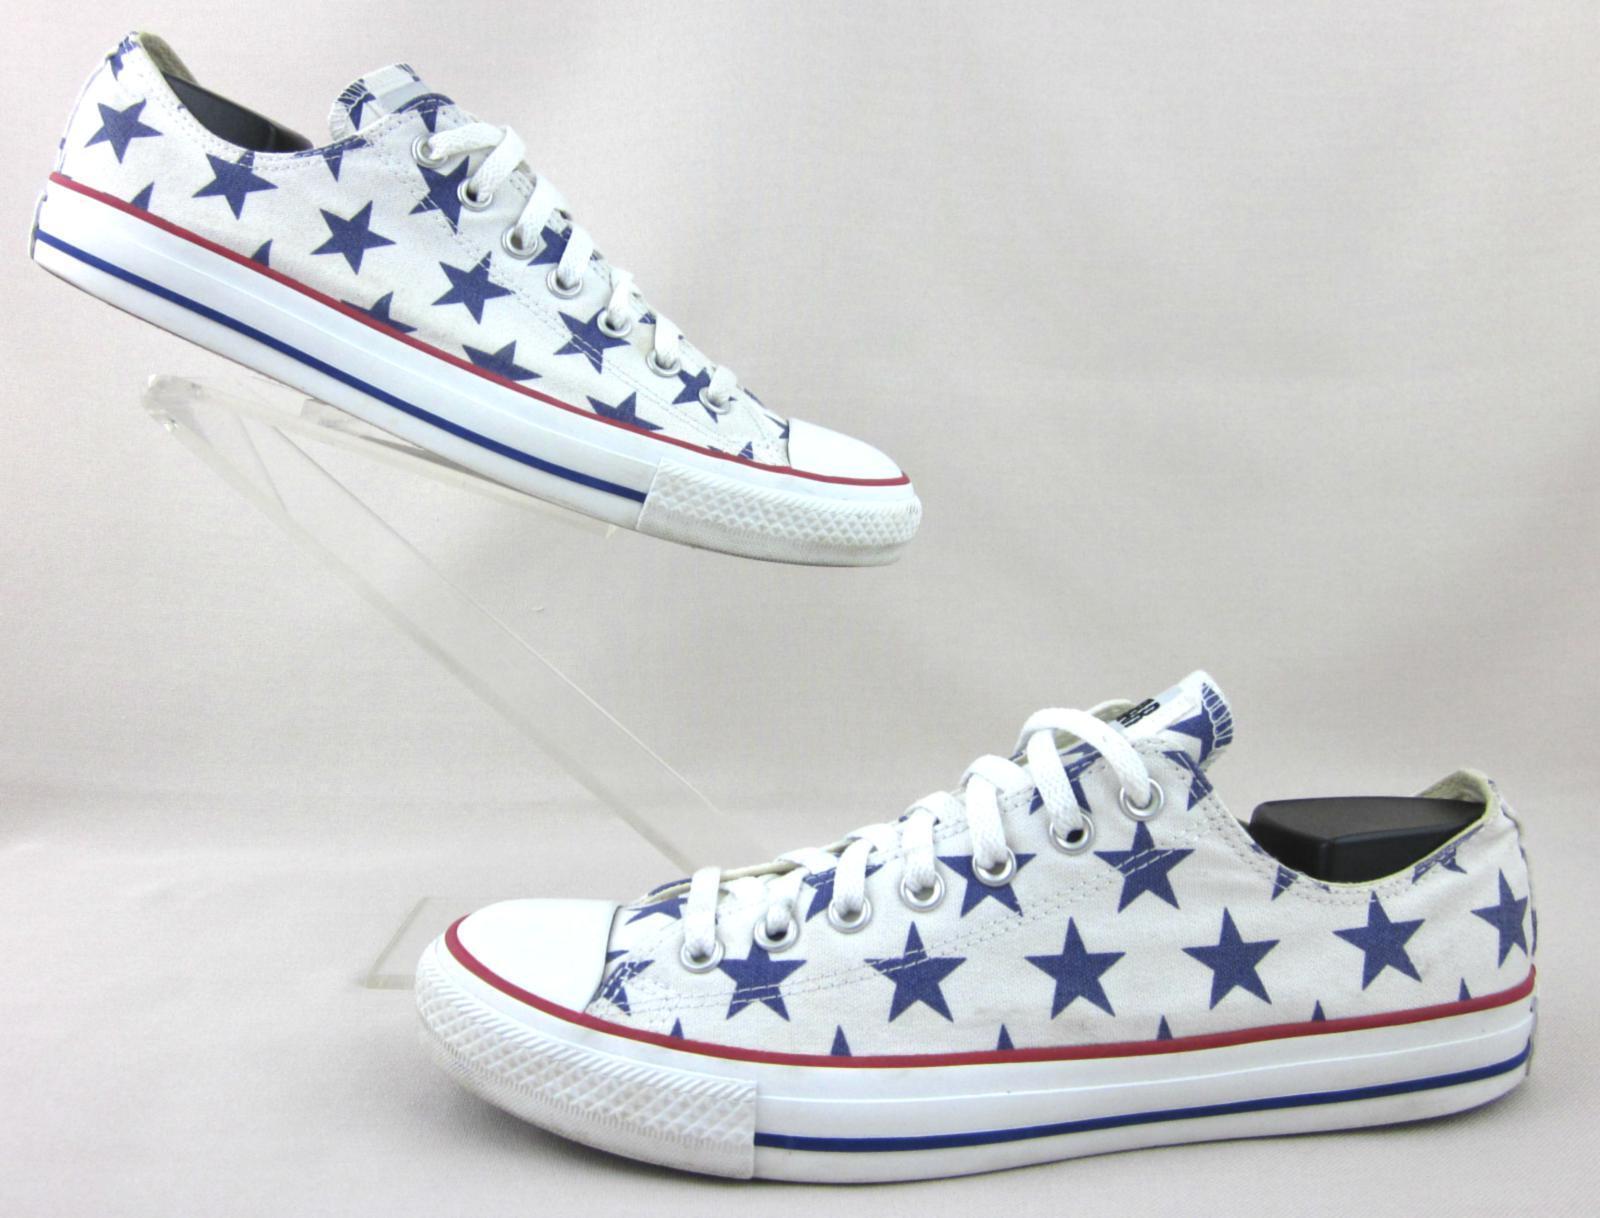 Converse All-Star Chuck Taylor Low Top Turnschuhe Multi Star Print 10 Fits 10.5-11